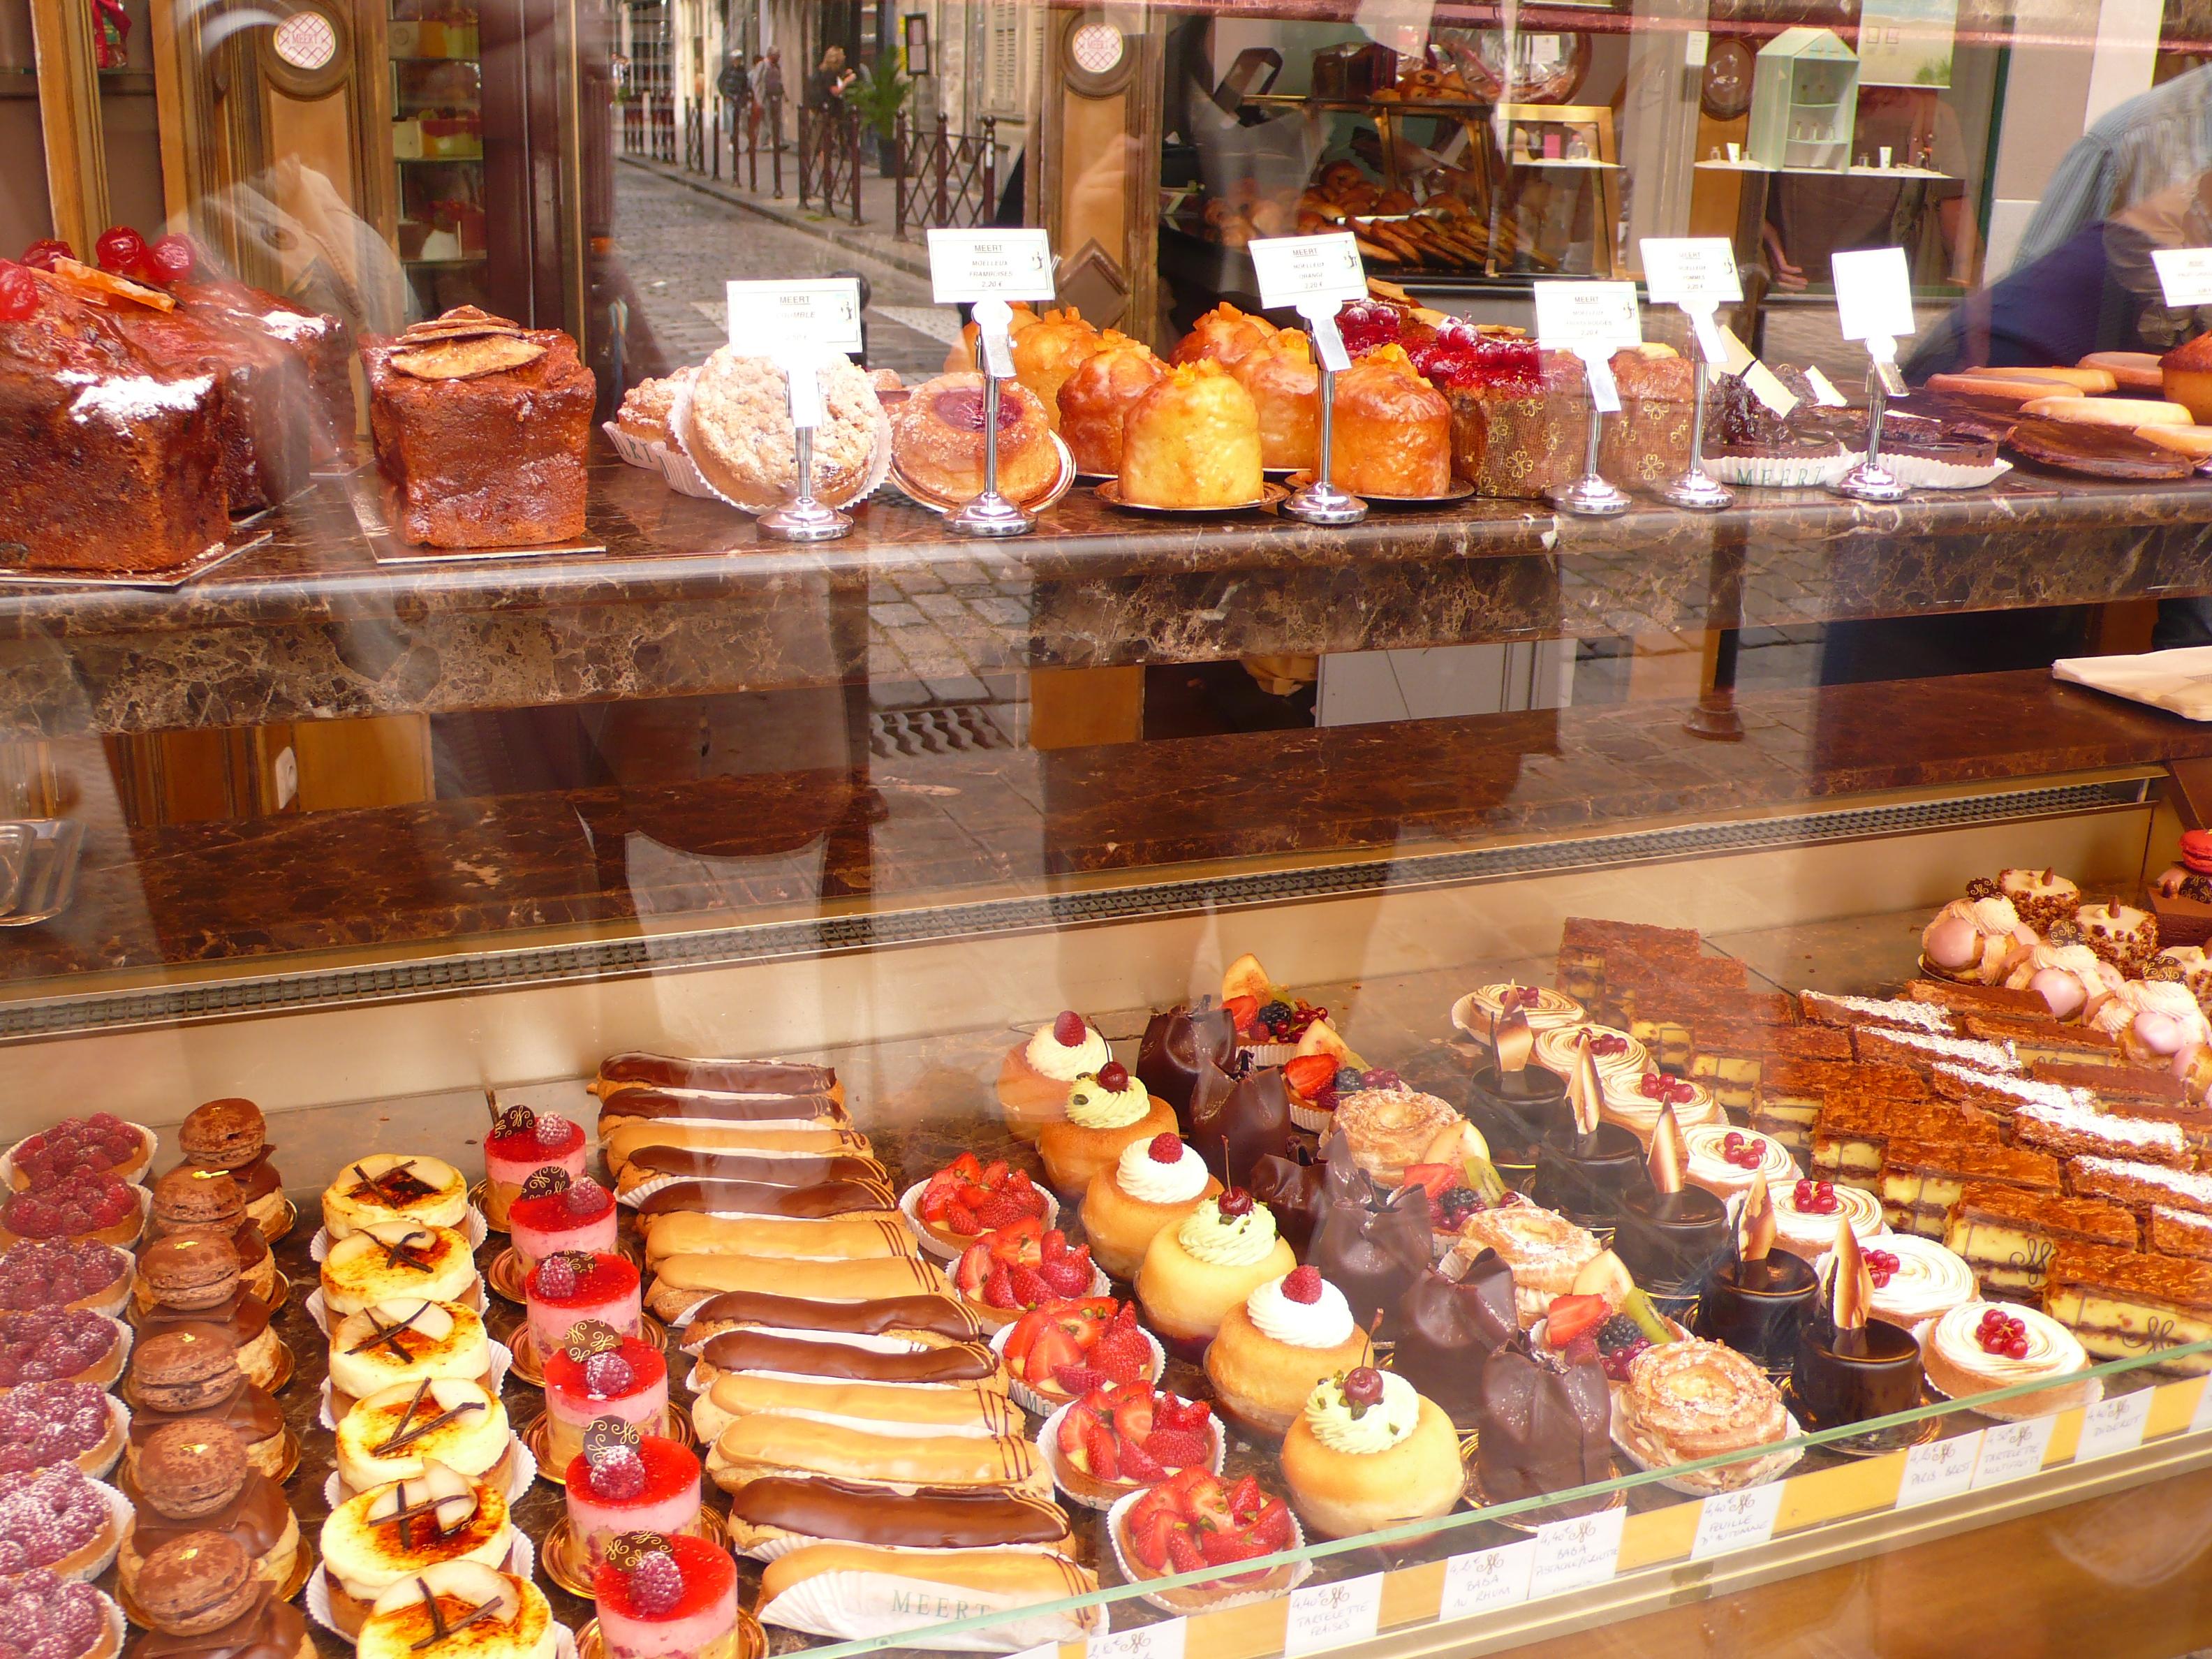 Civilisation fran aise licensed for non commercial use only boulangerie p tisserie - Decoration gateau professionnel ...